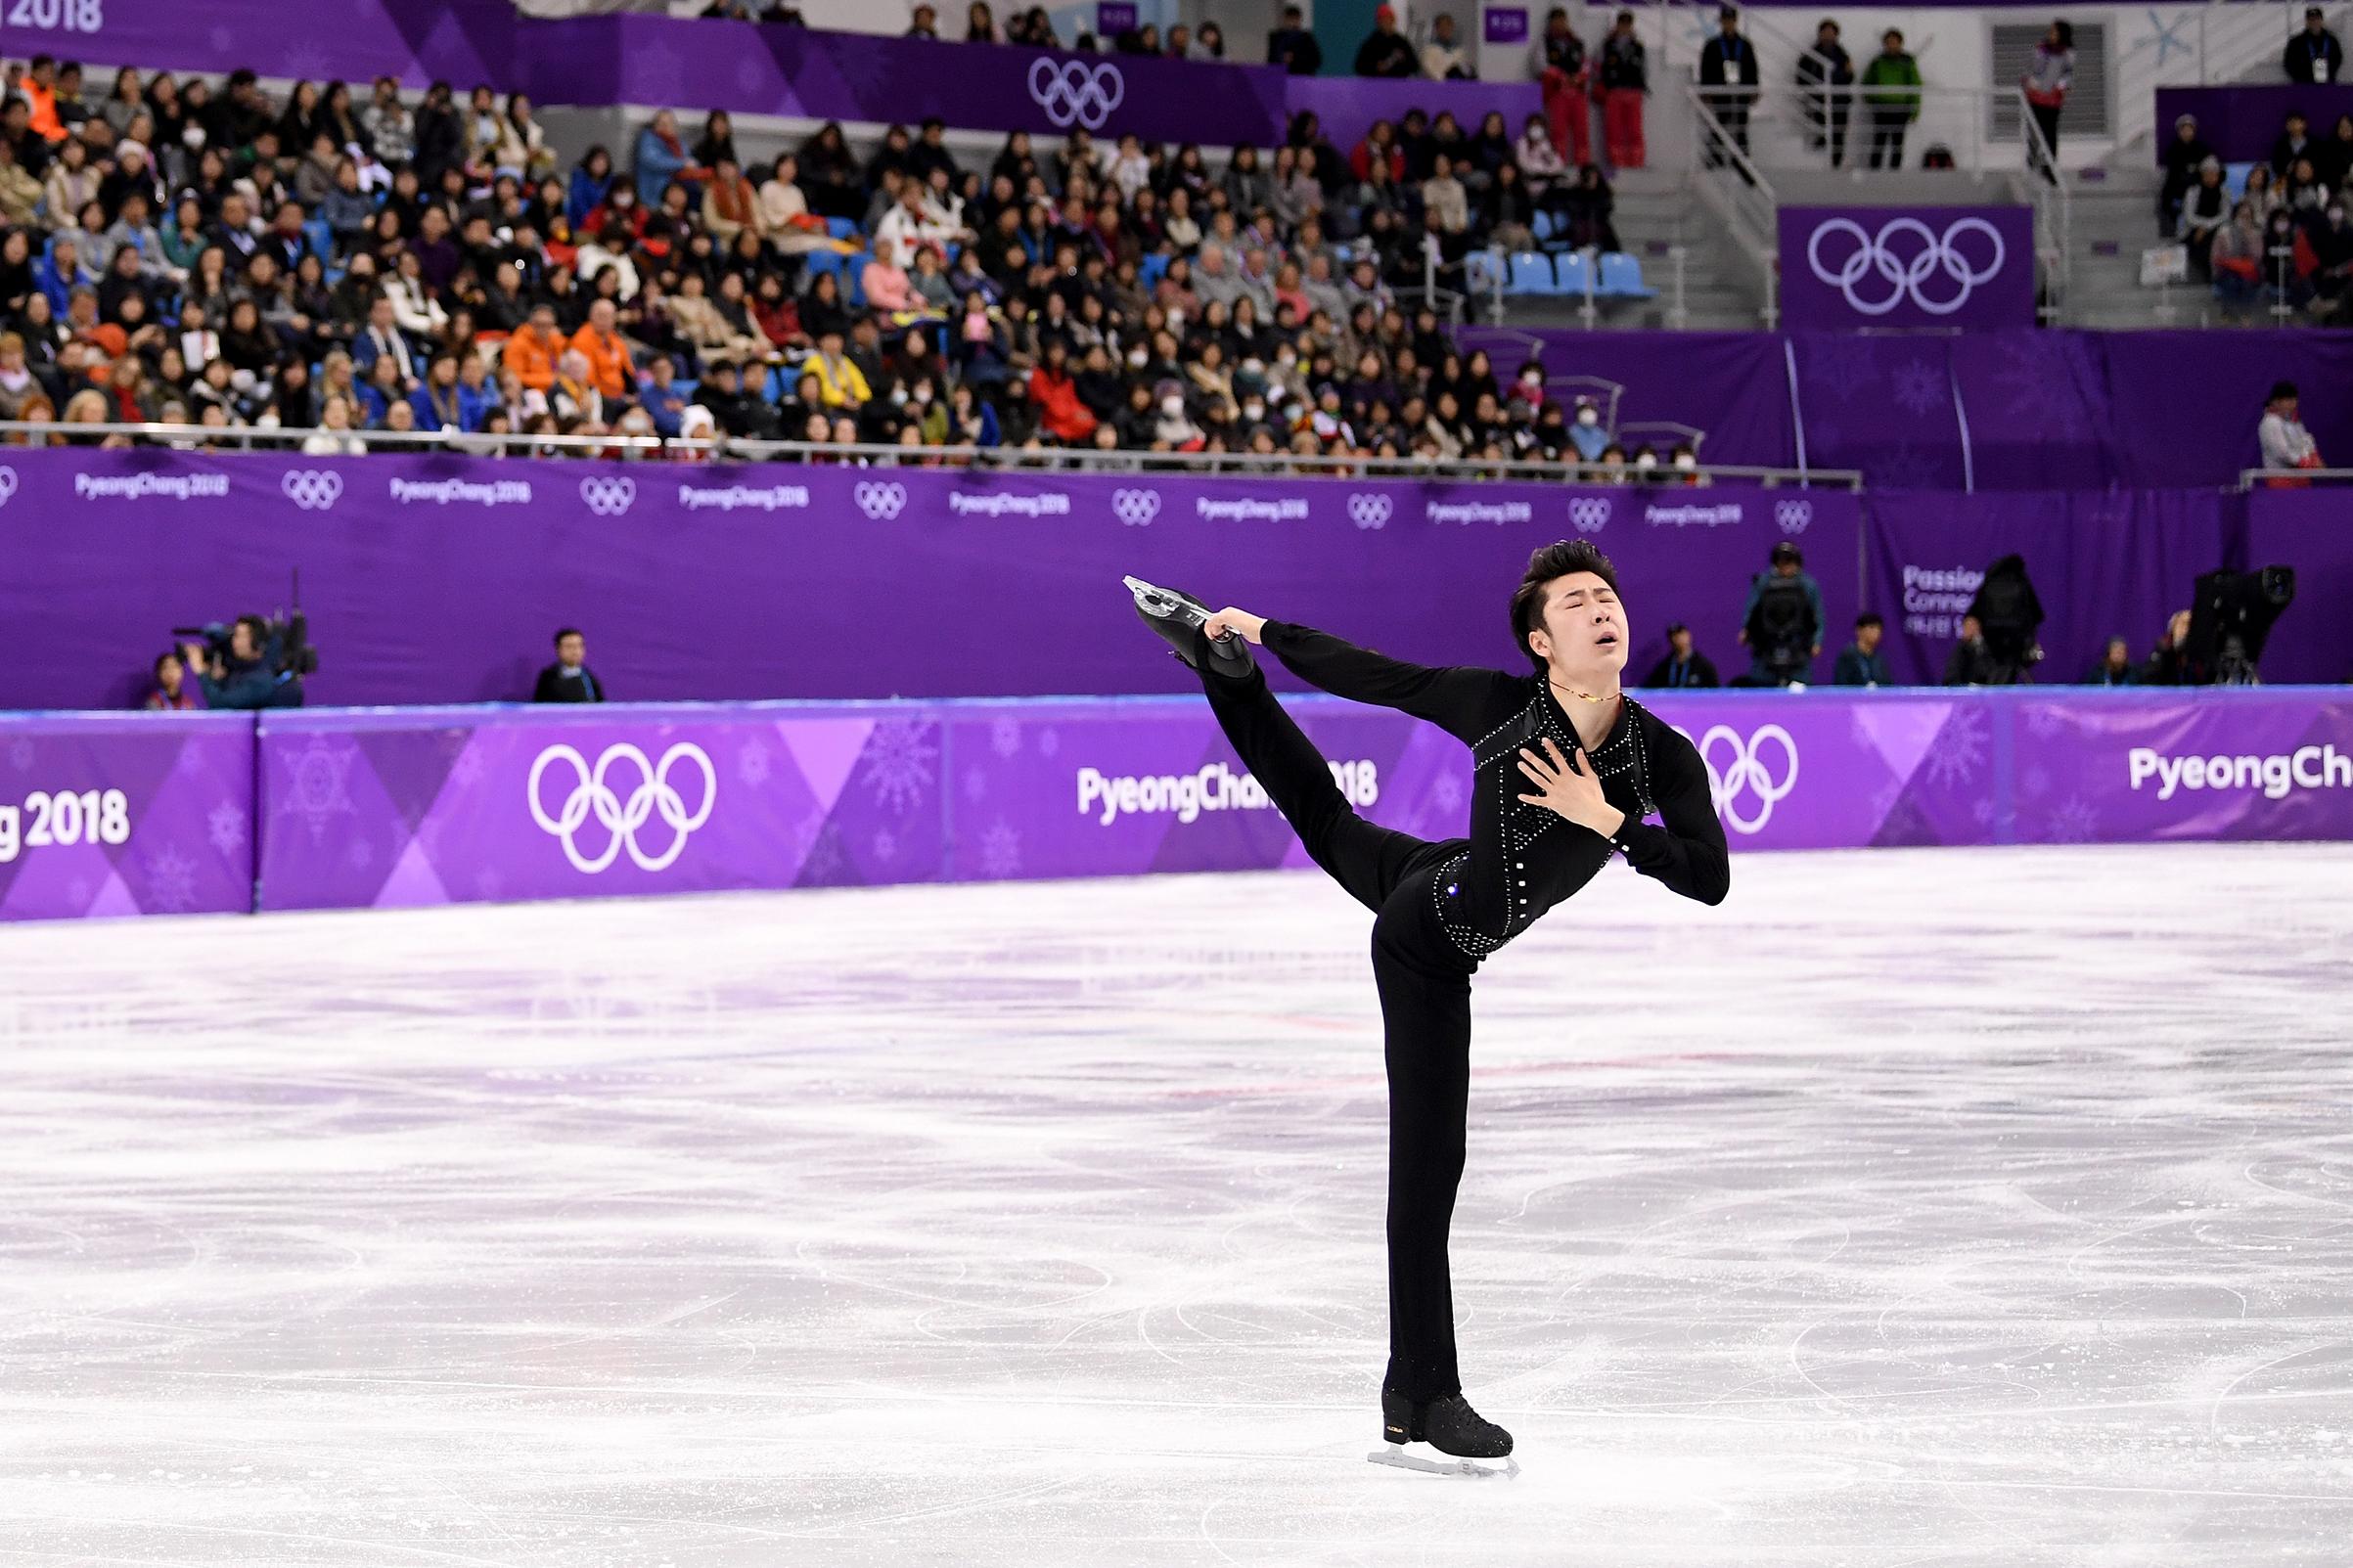 Jin Boyang of China competes during the Men's Single Skating Short Program at Gangneung Ice Arena on Feb. 16, 2018 in Gangneung, South Korea.